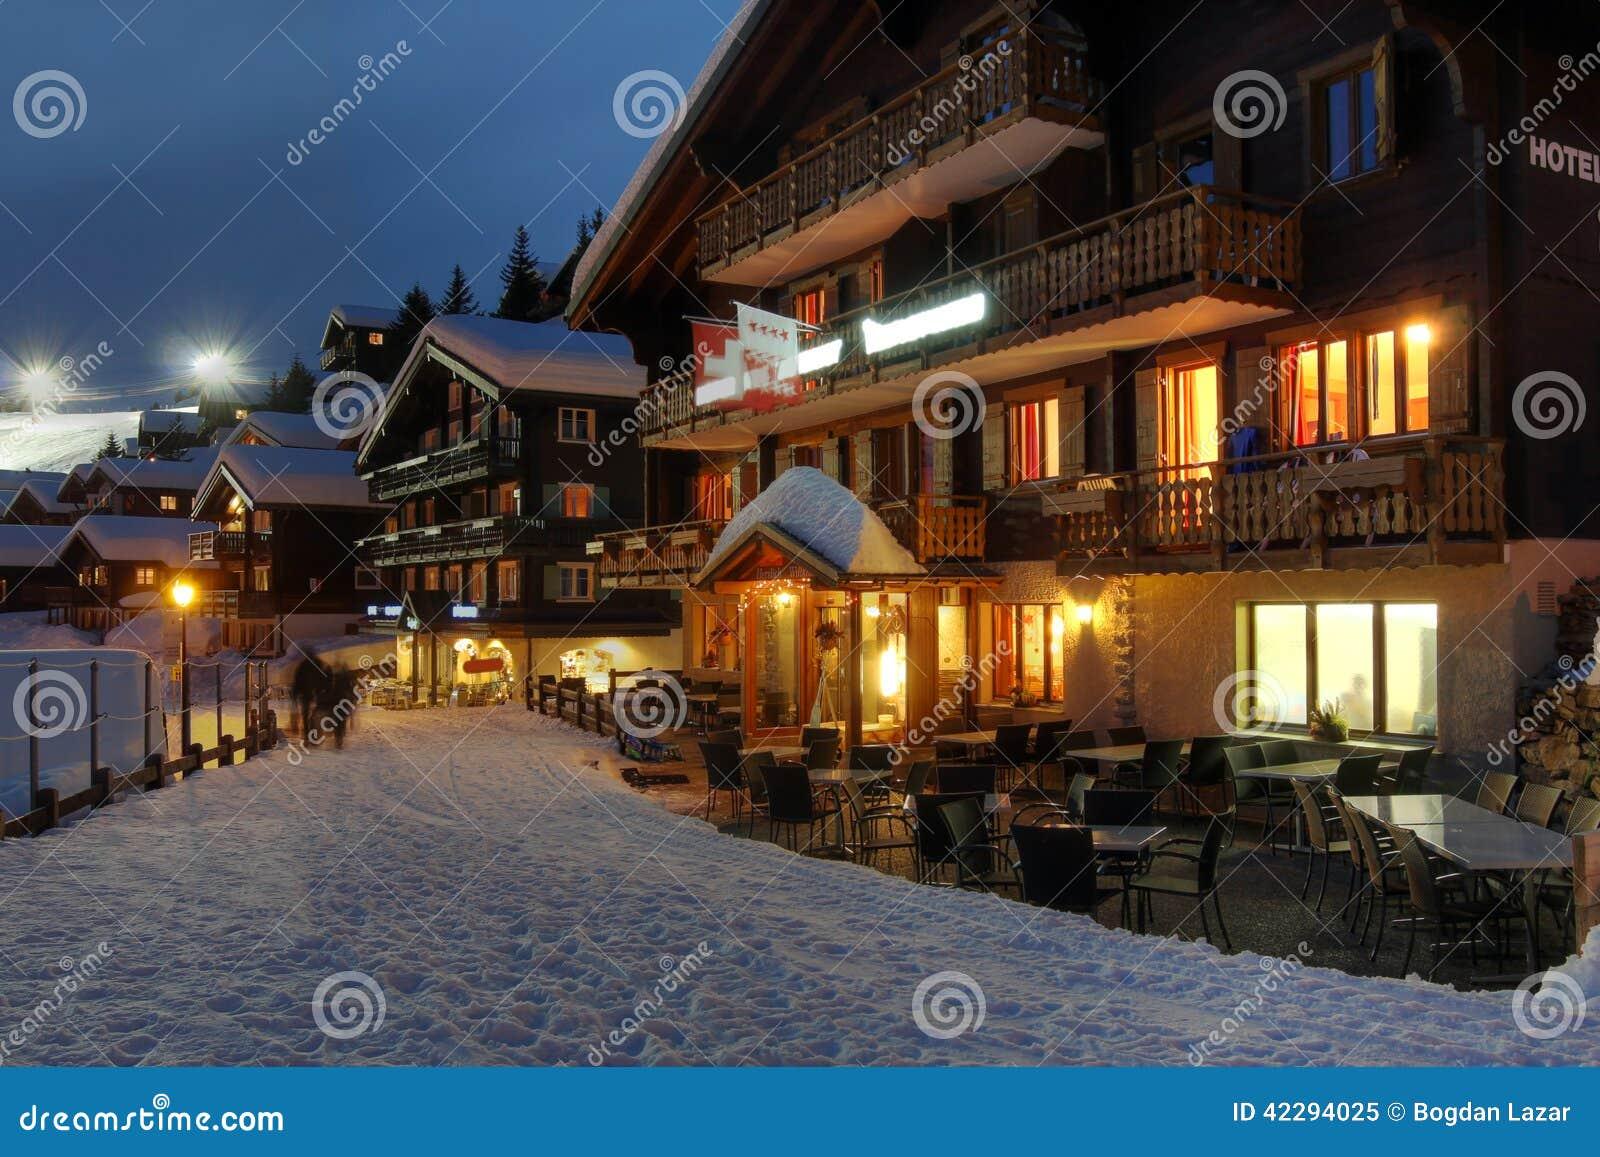 Bettmeralp Switzerland  city images : Hotel and winter resort scene in Bettmeralp, Switzerland at night.